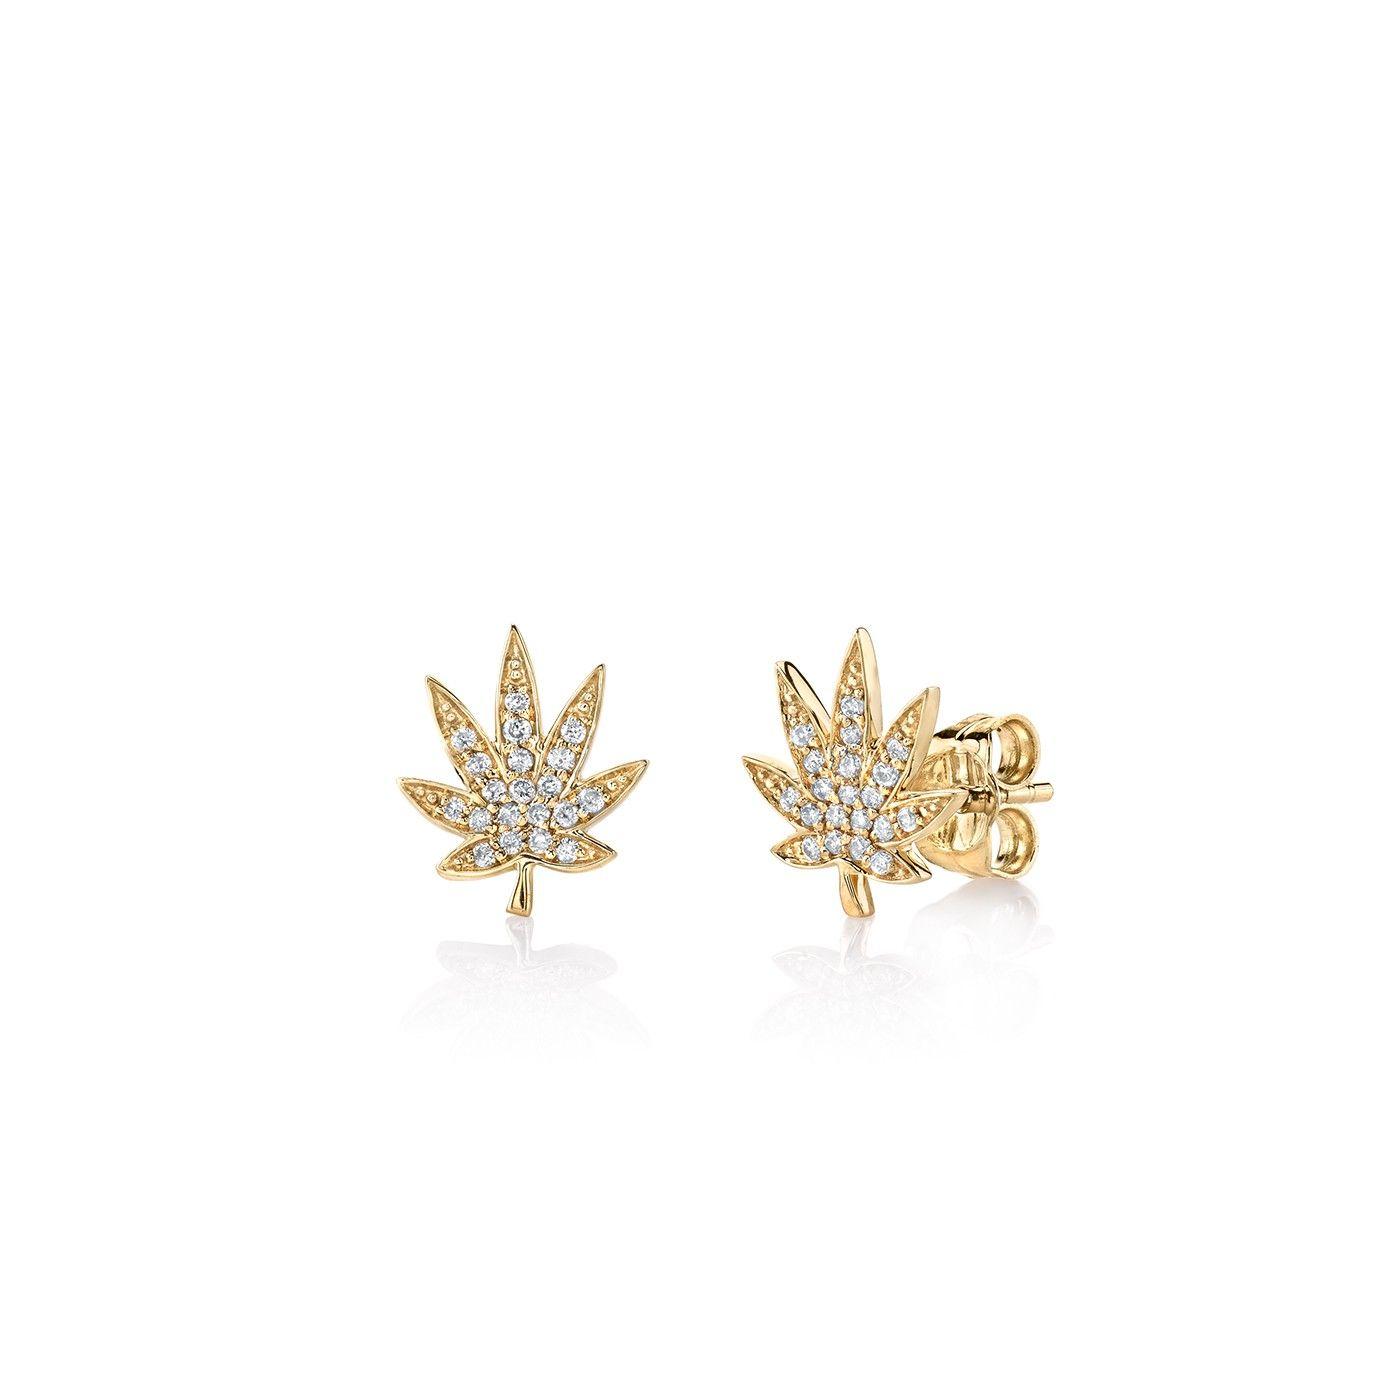 Fine Small Gold Earrings Latest Design Wallpaper Gallery - Jewelry ...